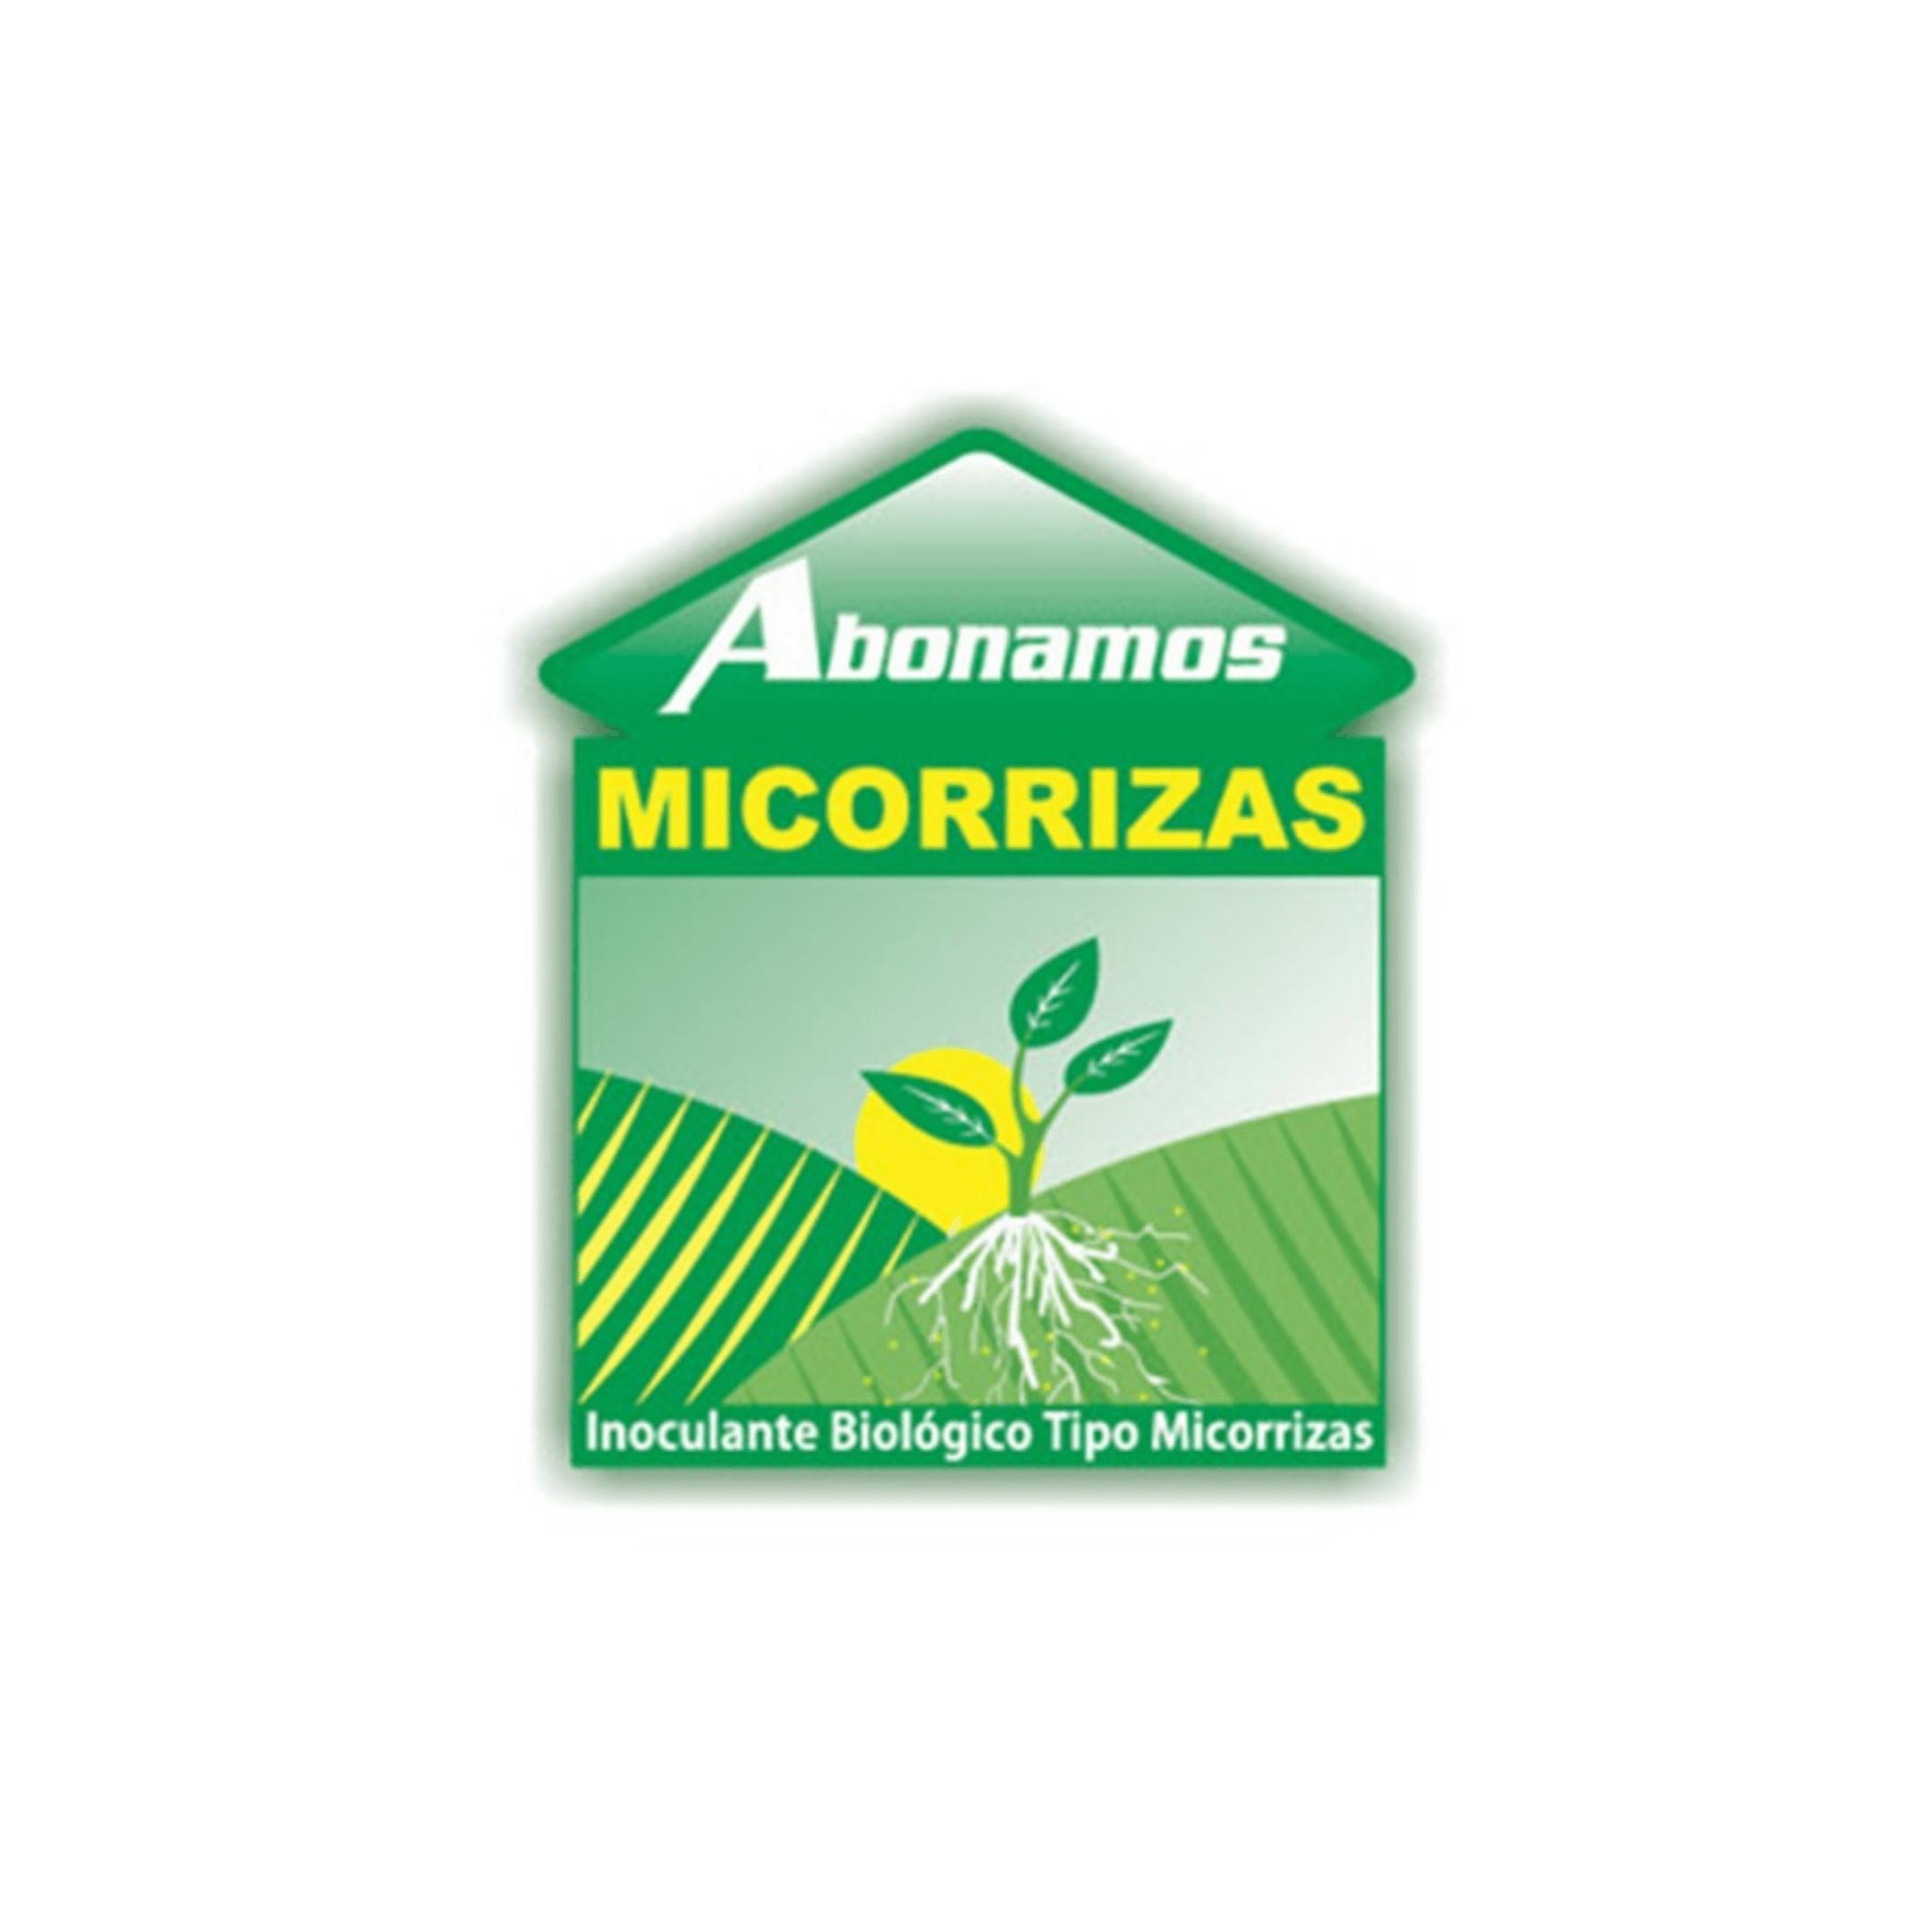 7 Bioinsumo orgánico Abonamos Micorrizas de Sobiotech.png